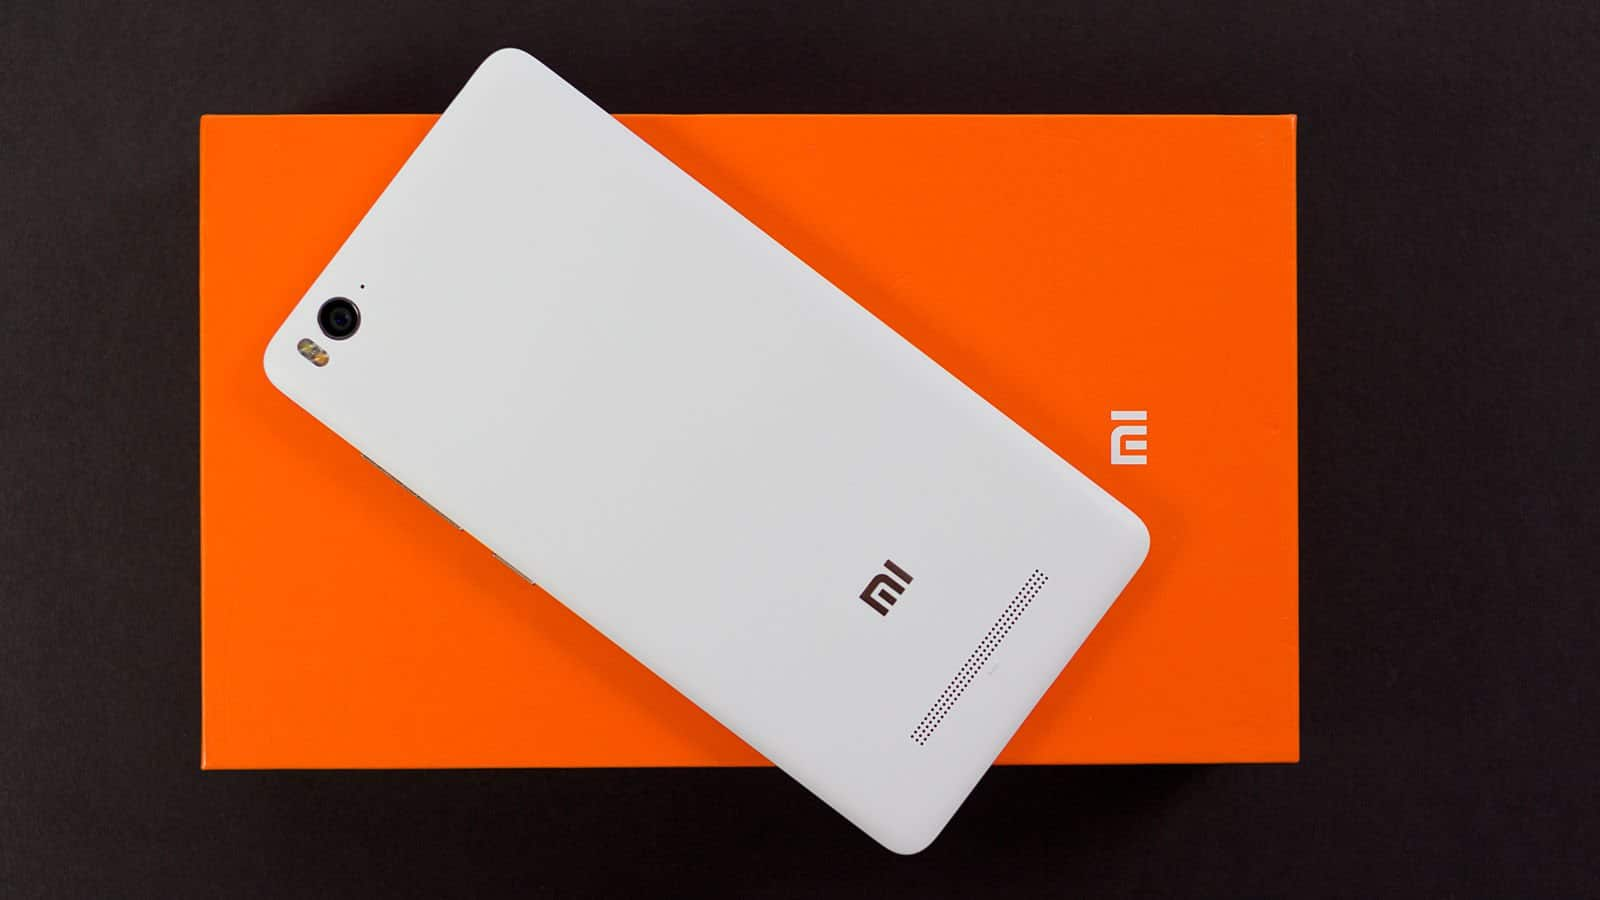 Xiaomi poder apresentar um smartphone de topo de 43 stopboris Image collections